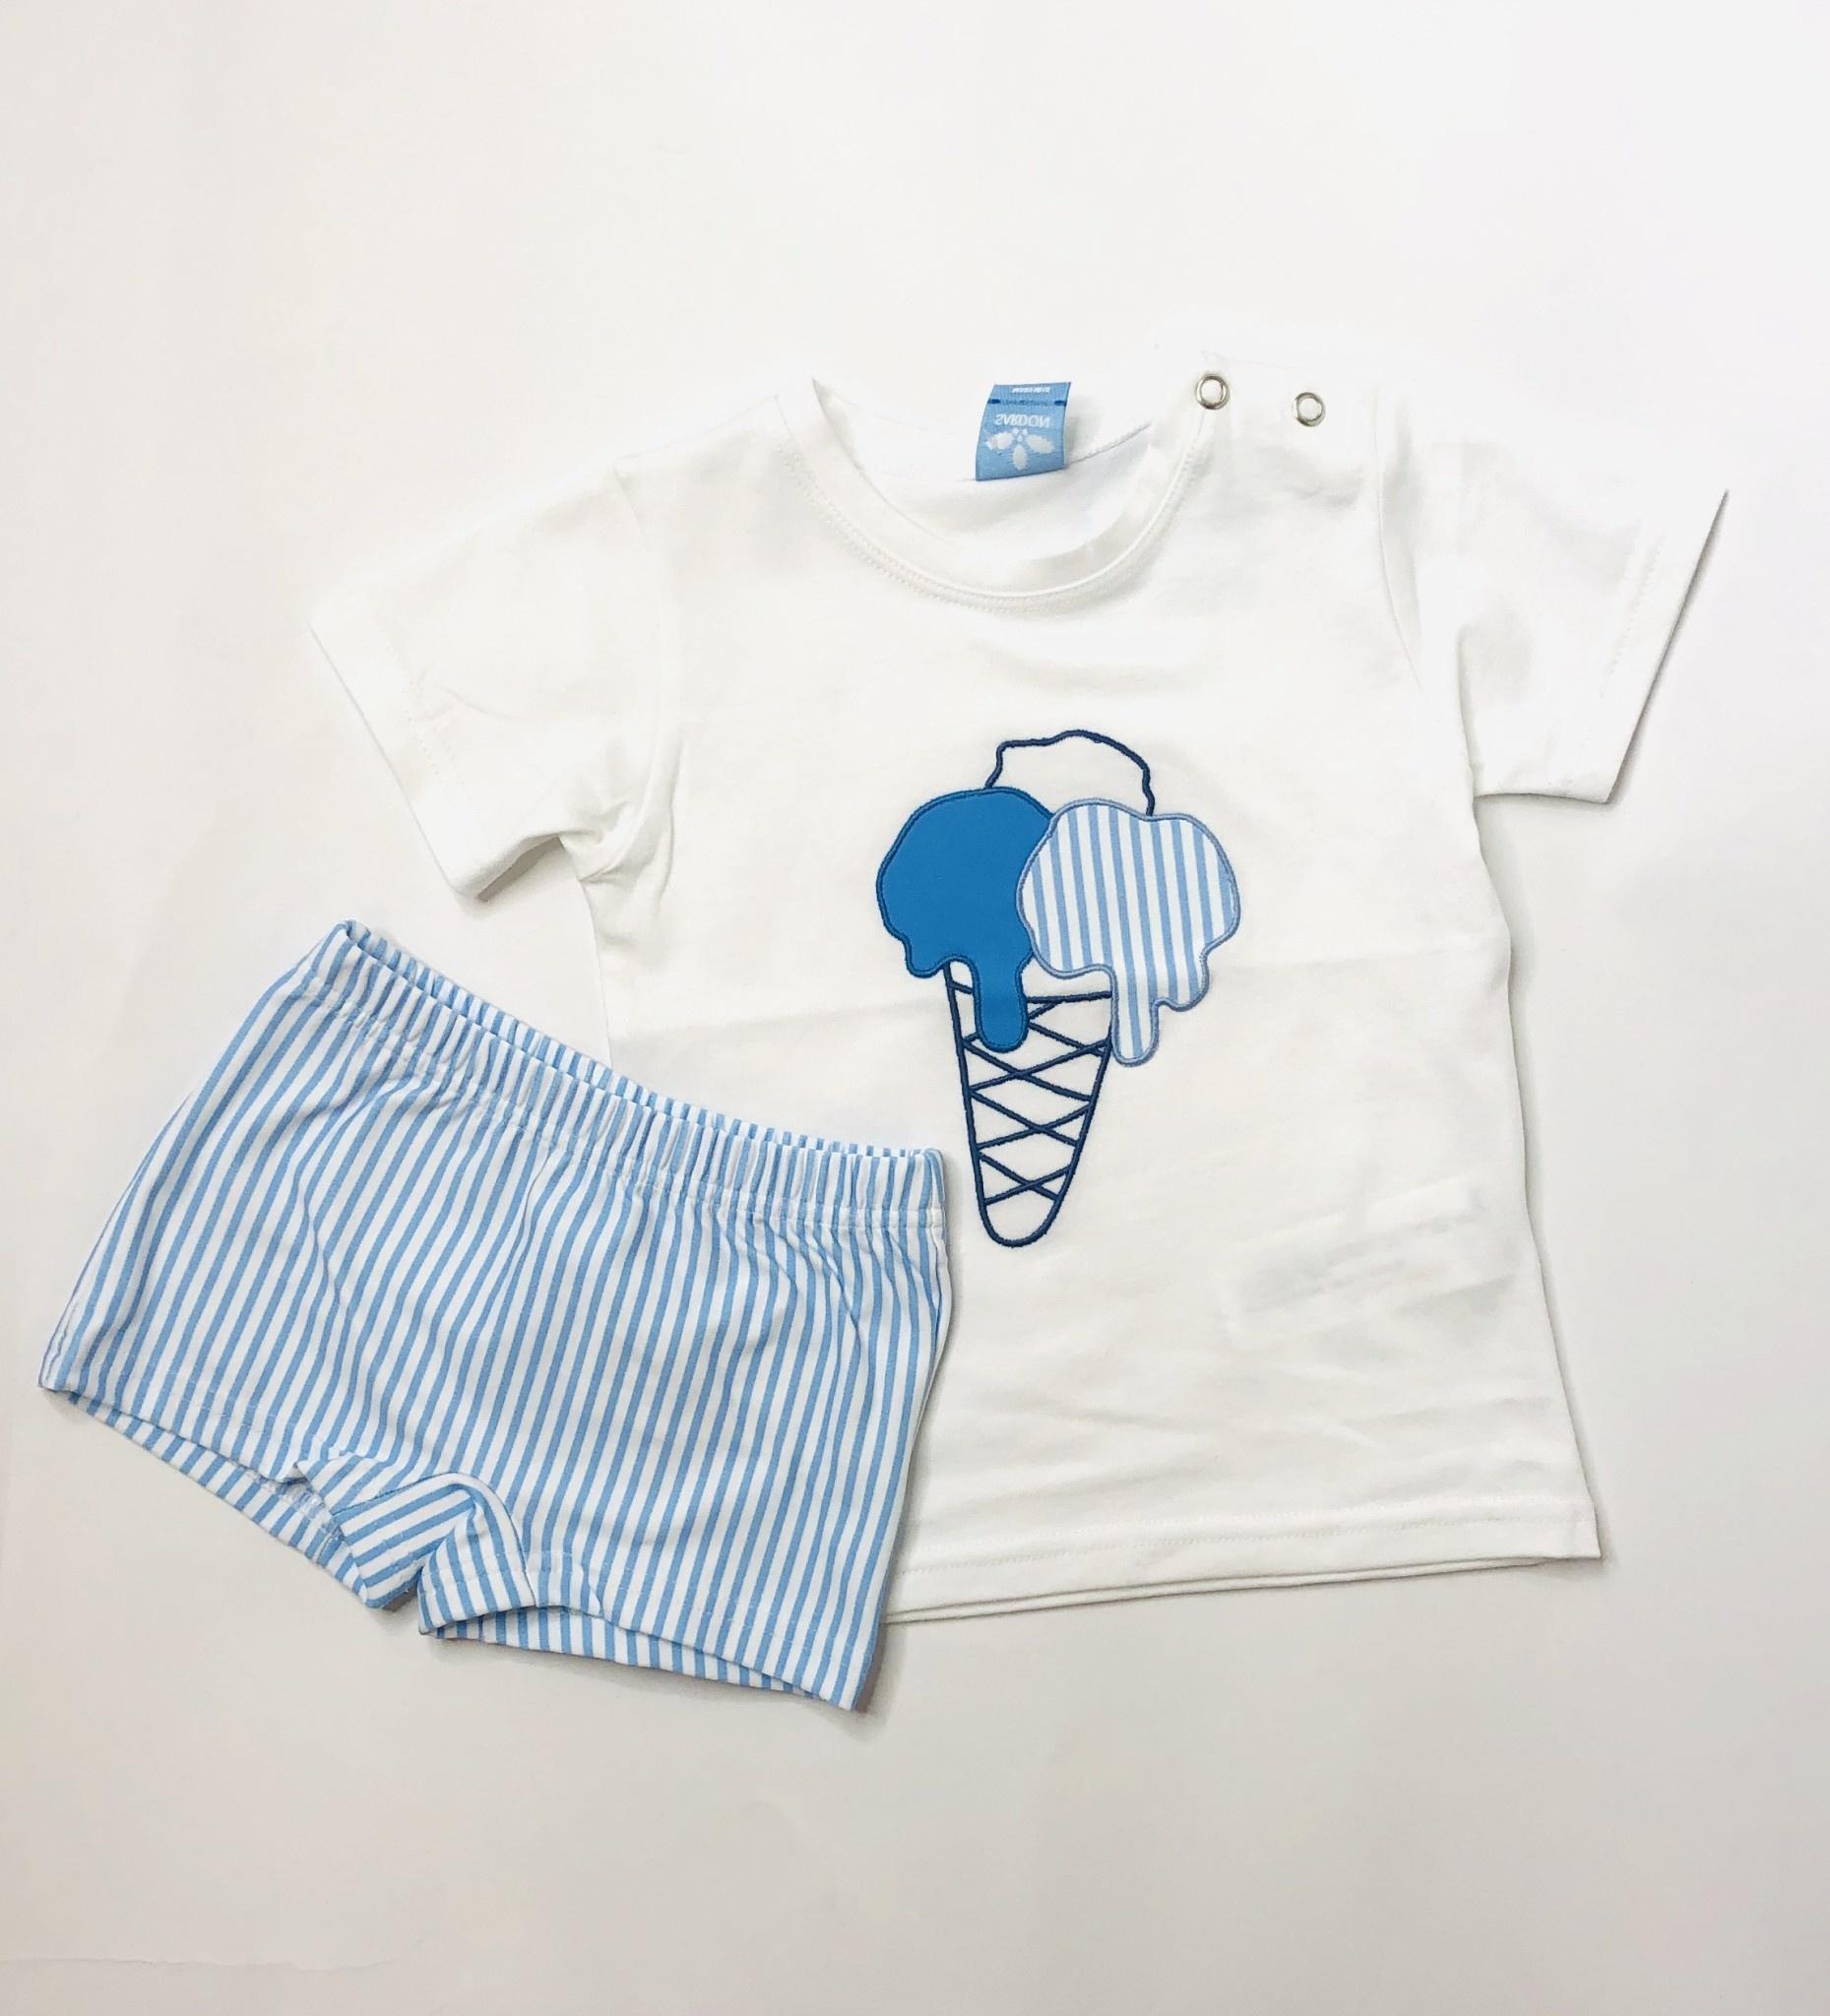 Sardon Sardon Boys Ice-cream top & Swim Shorts Set